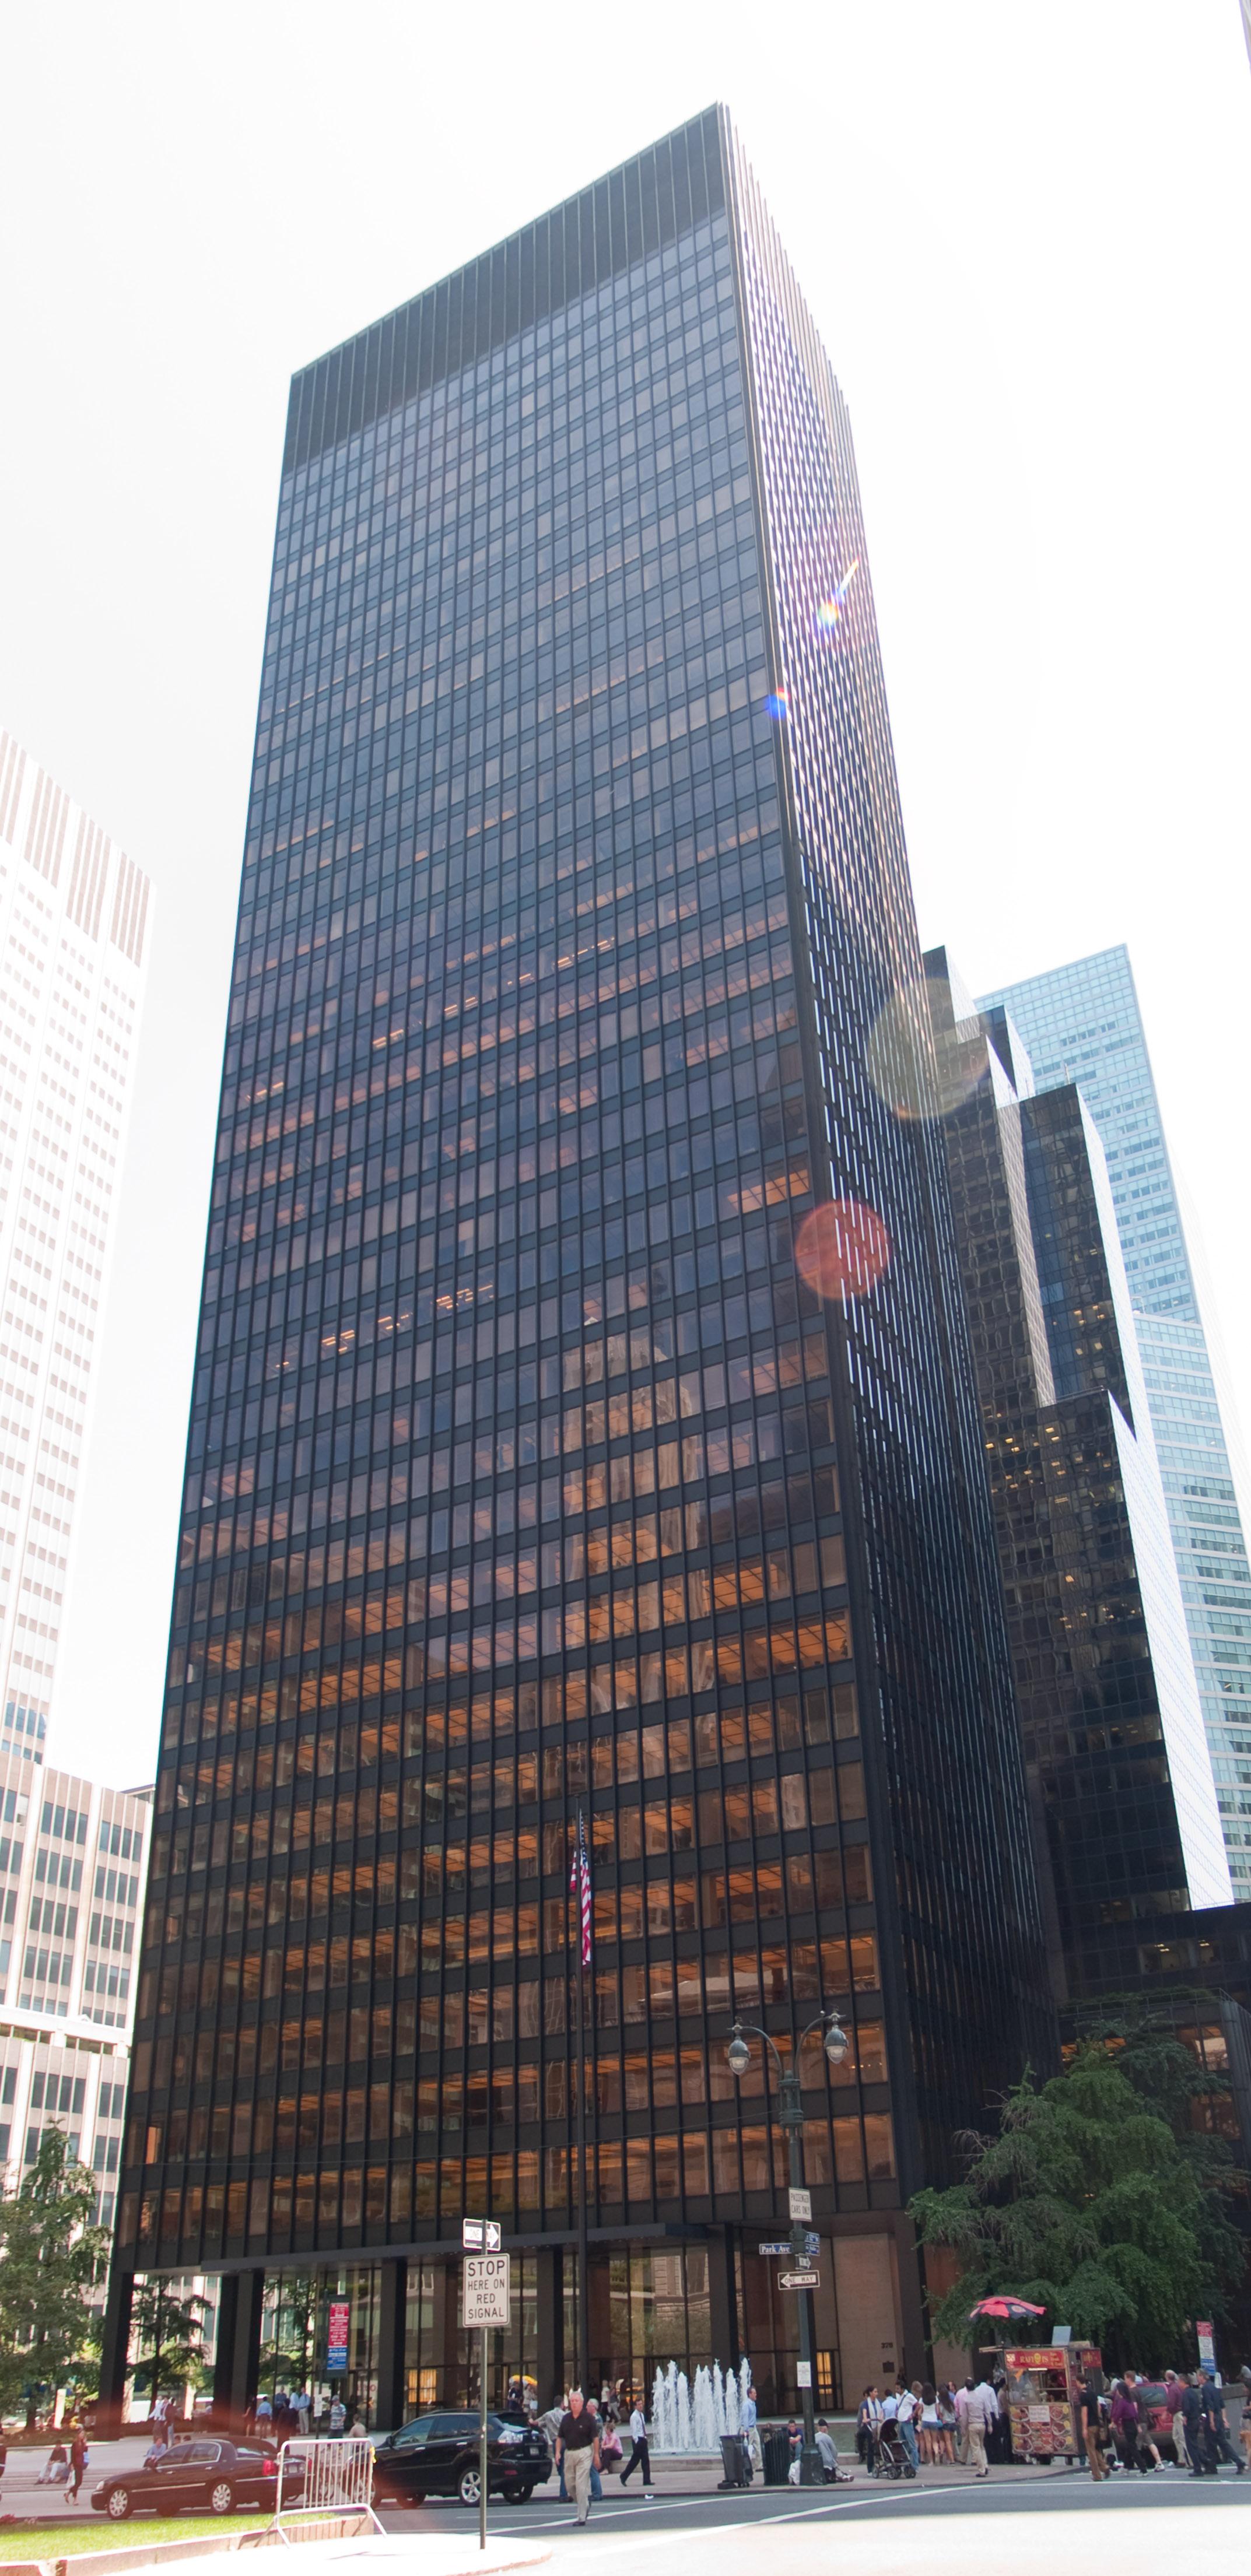 Buildings Seagram Building